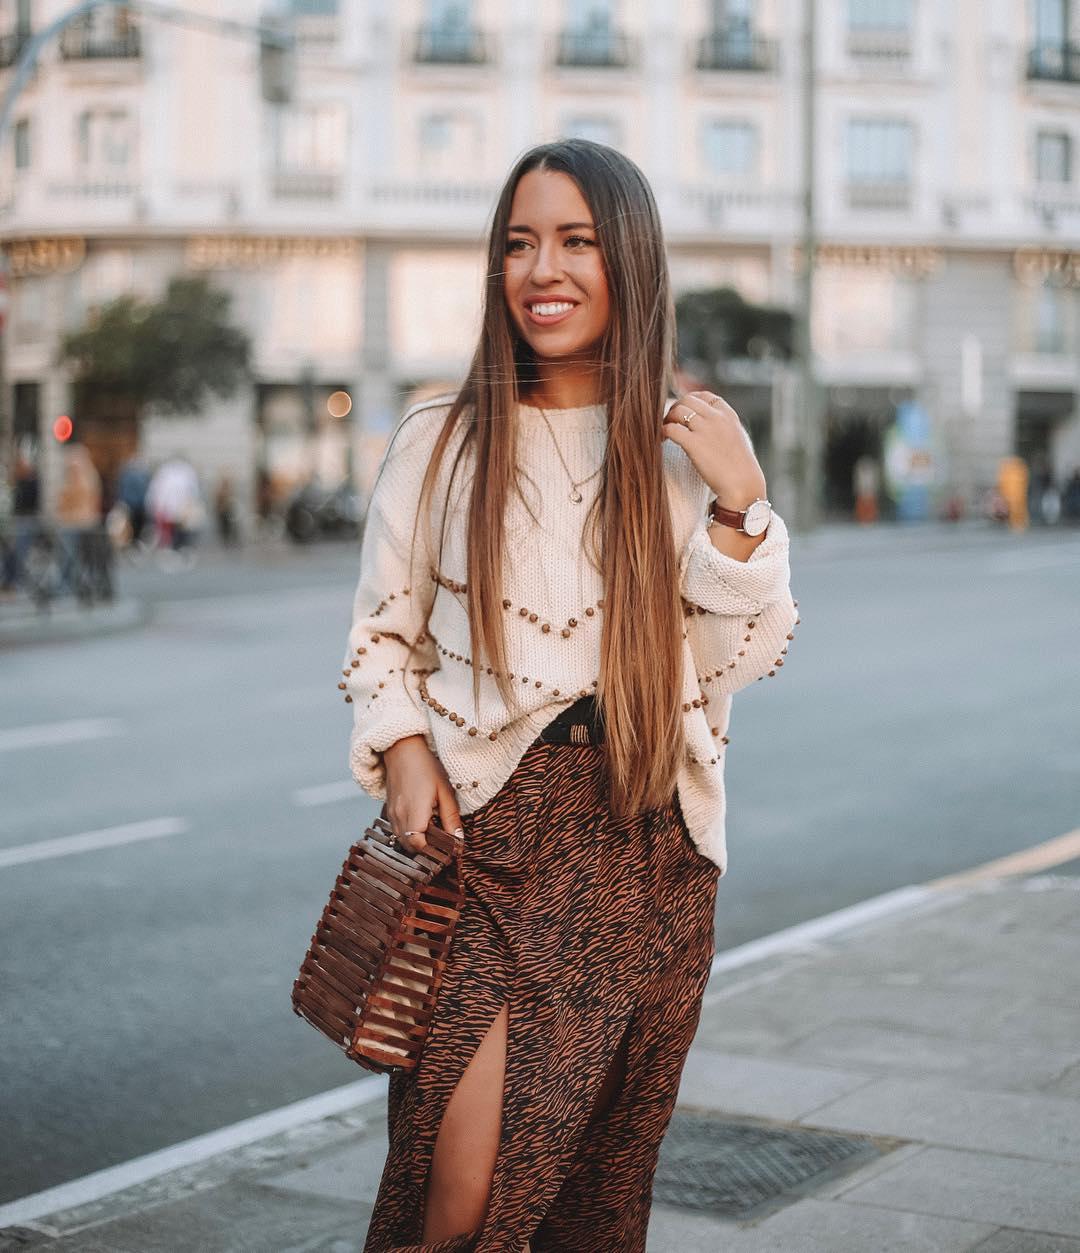 jupe à imprimé animalier avec ceinture de Zara sur lorenagodoy